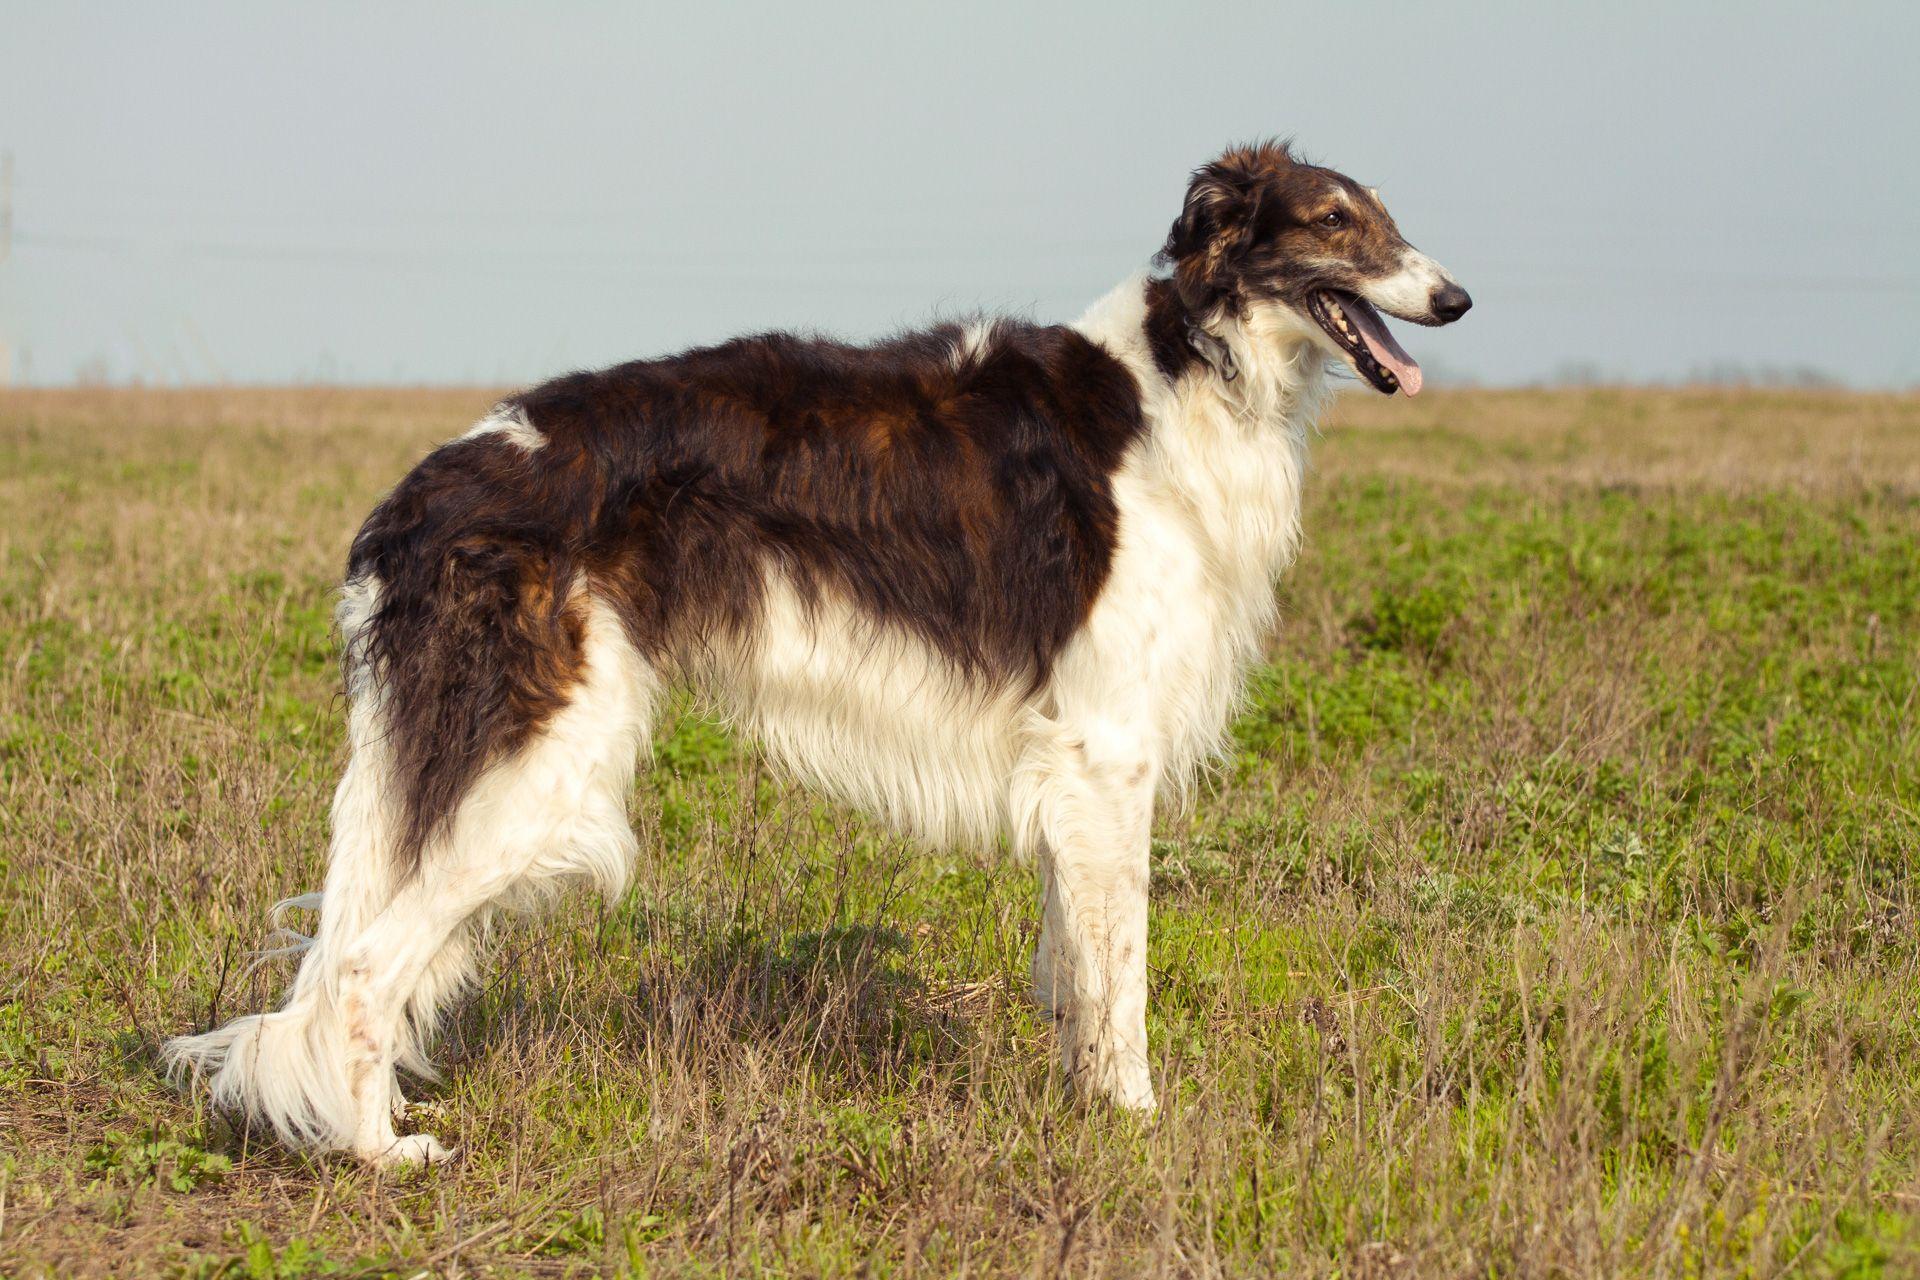 Pin By Sabine On Barsoi Russischer Windhund Borzoi Dog Dog Breeds Borzoi